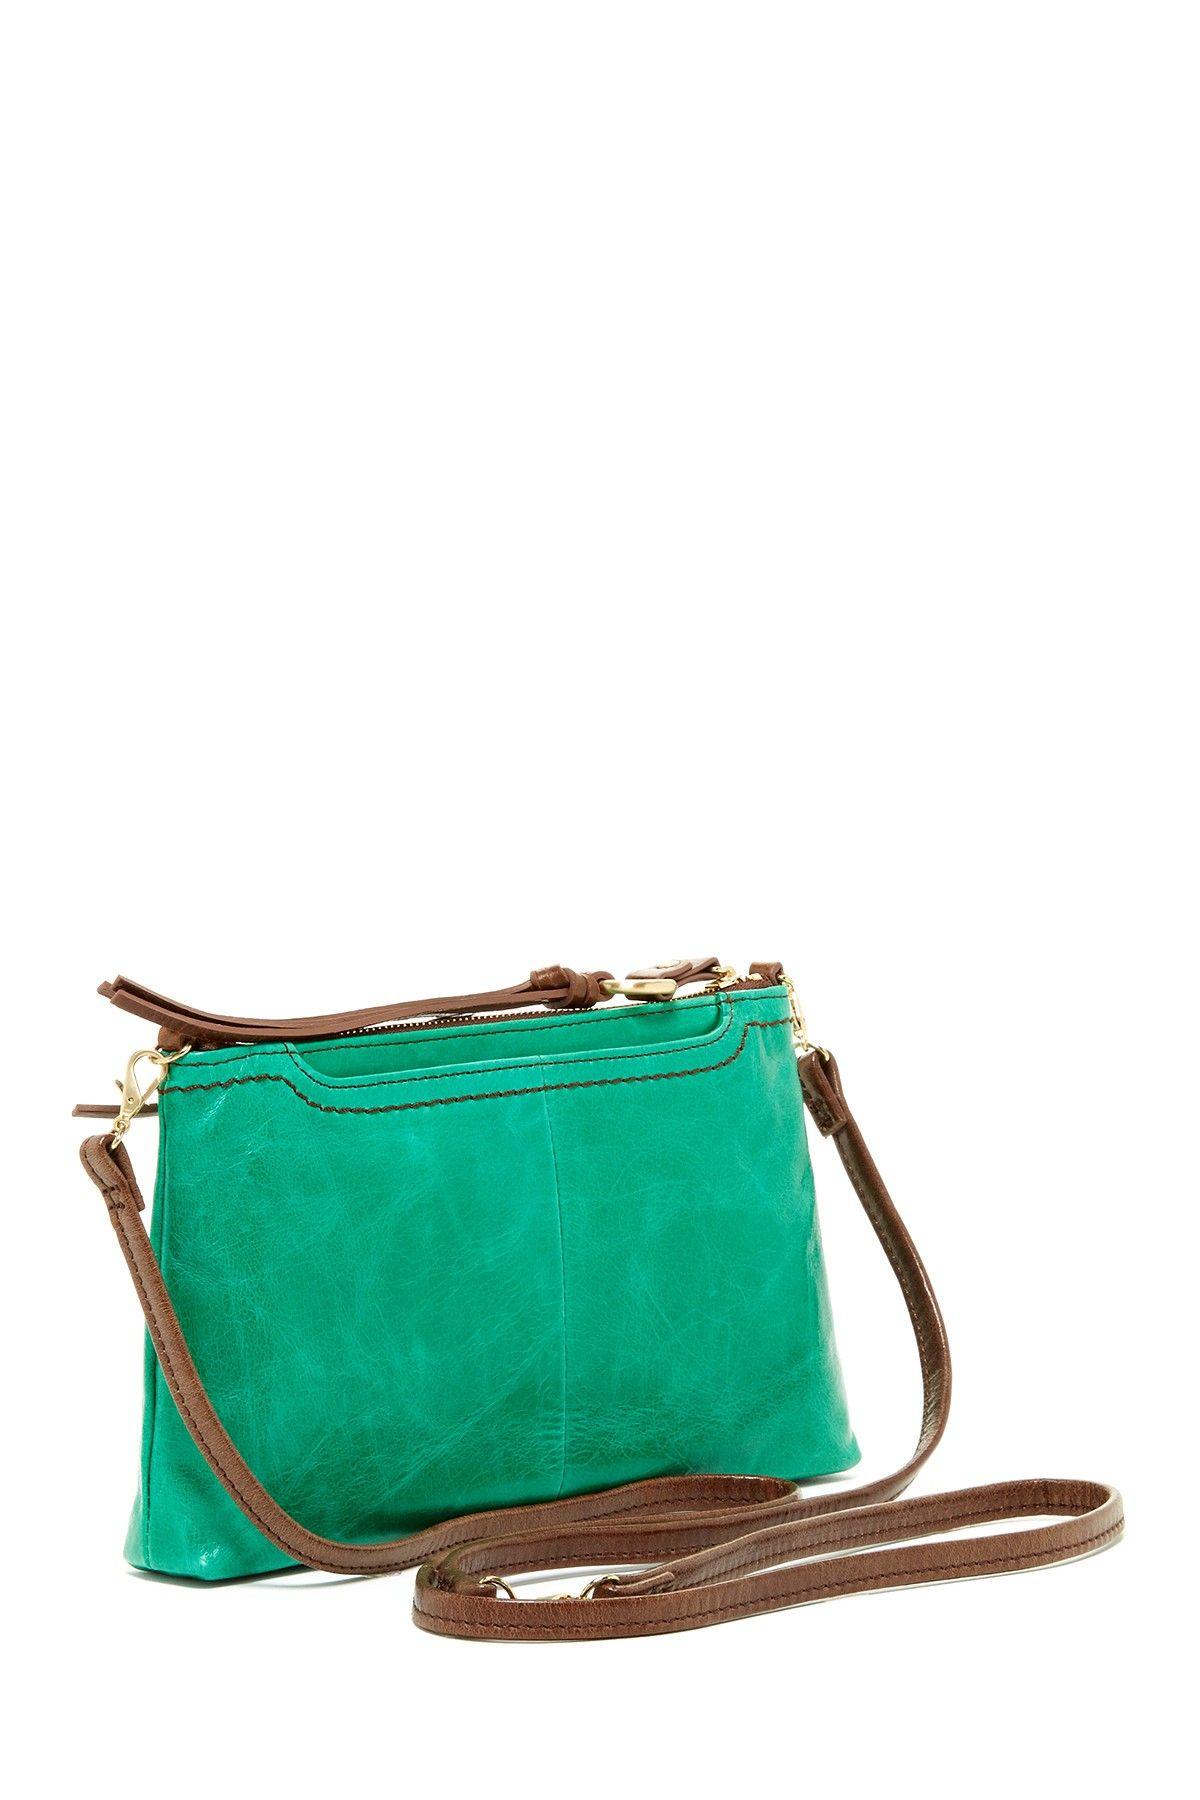 Love this green cross body bag.